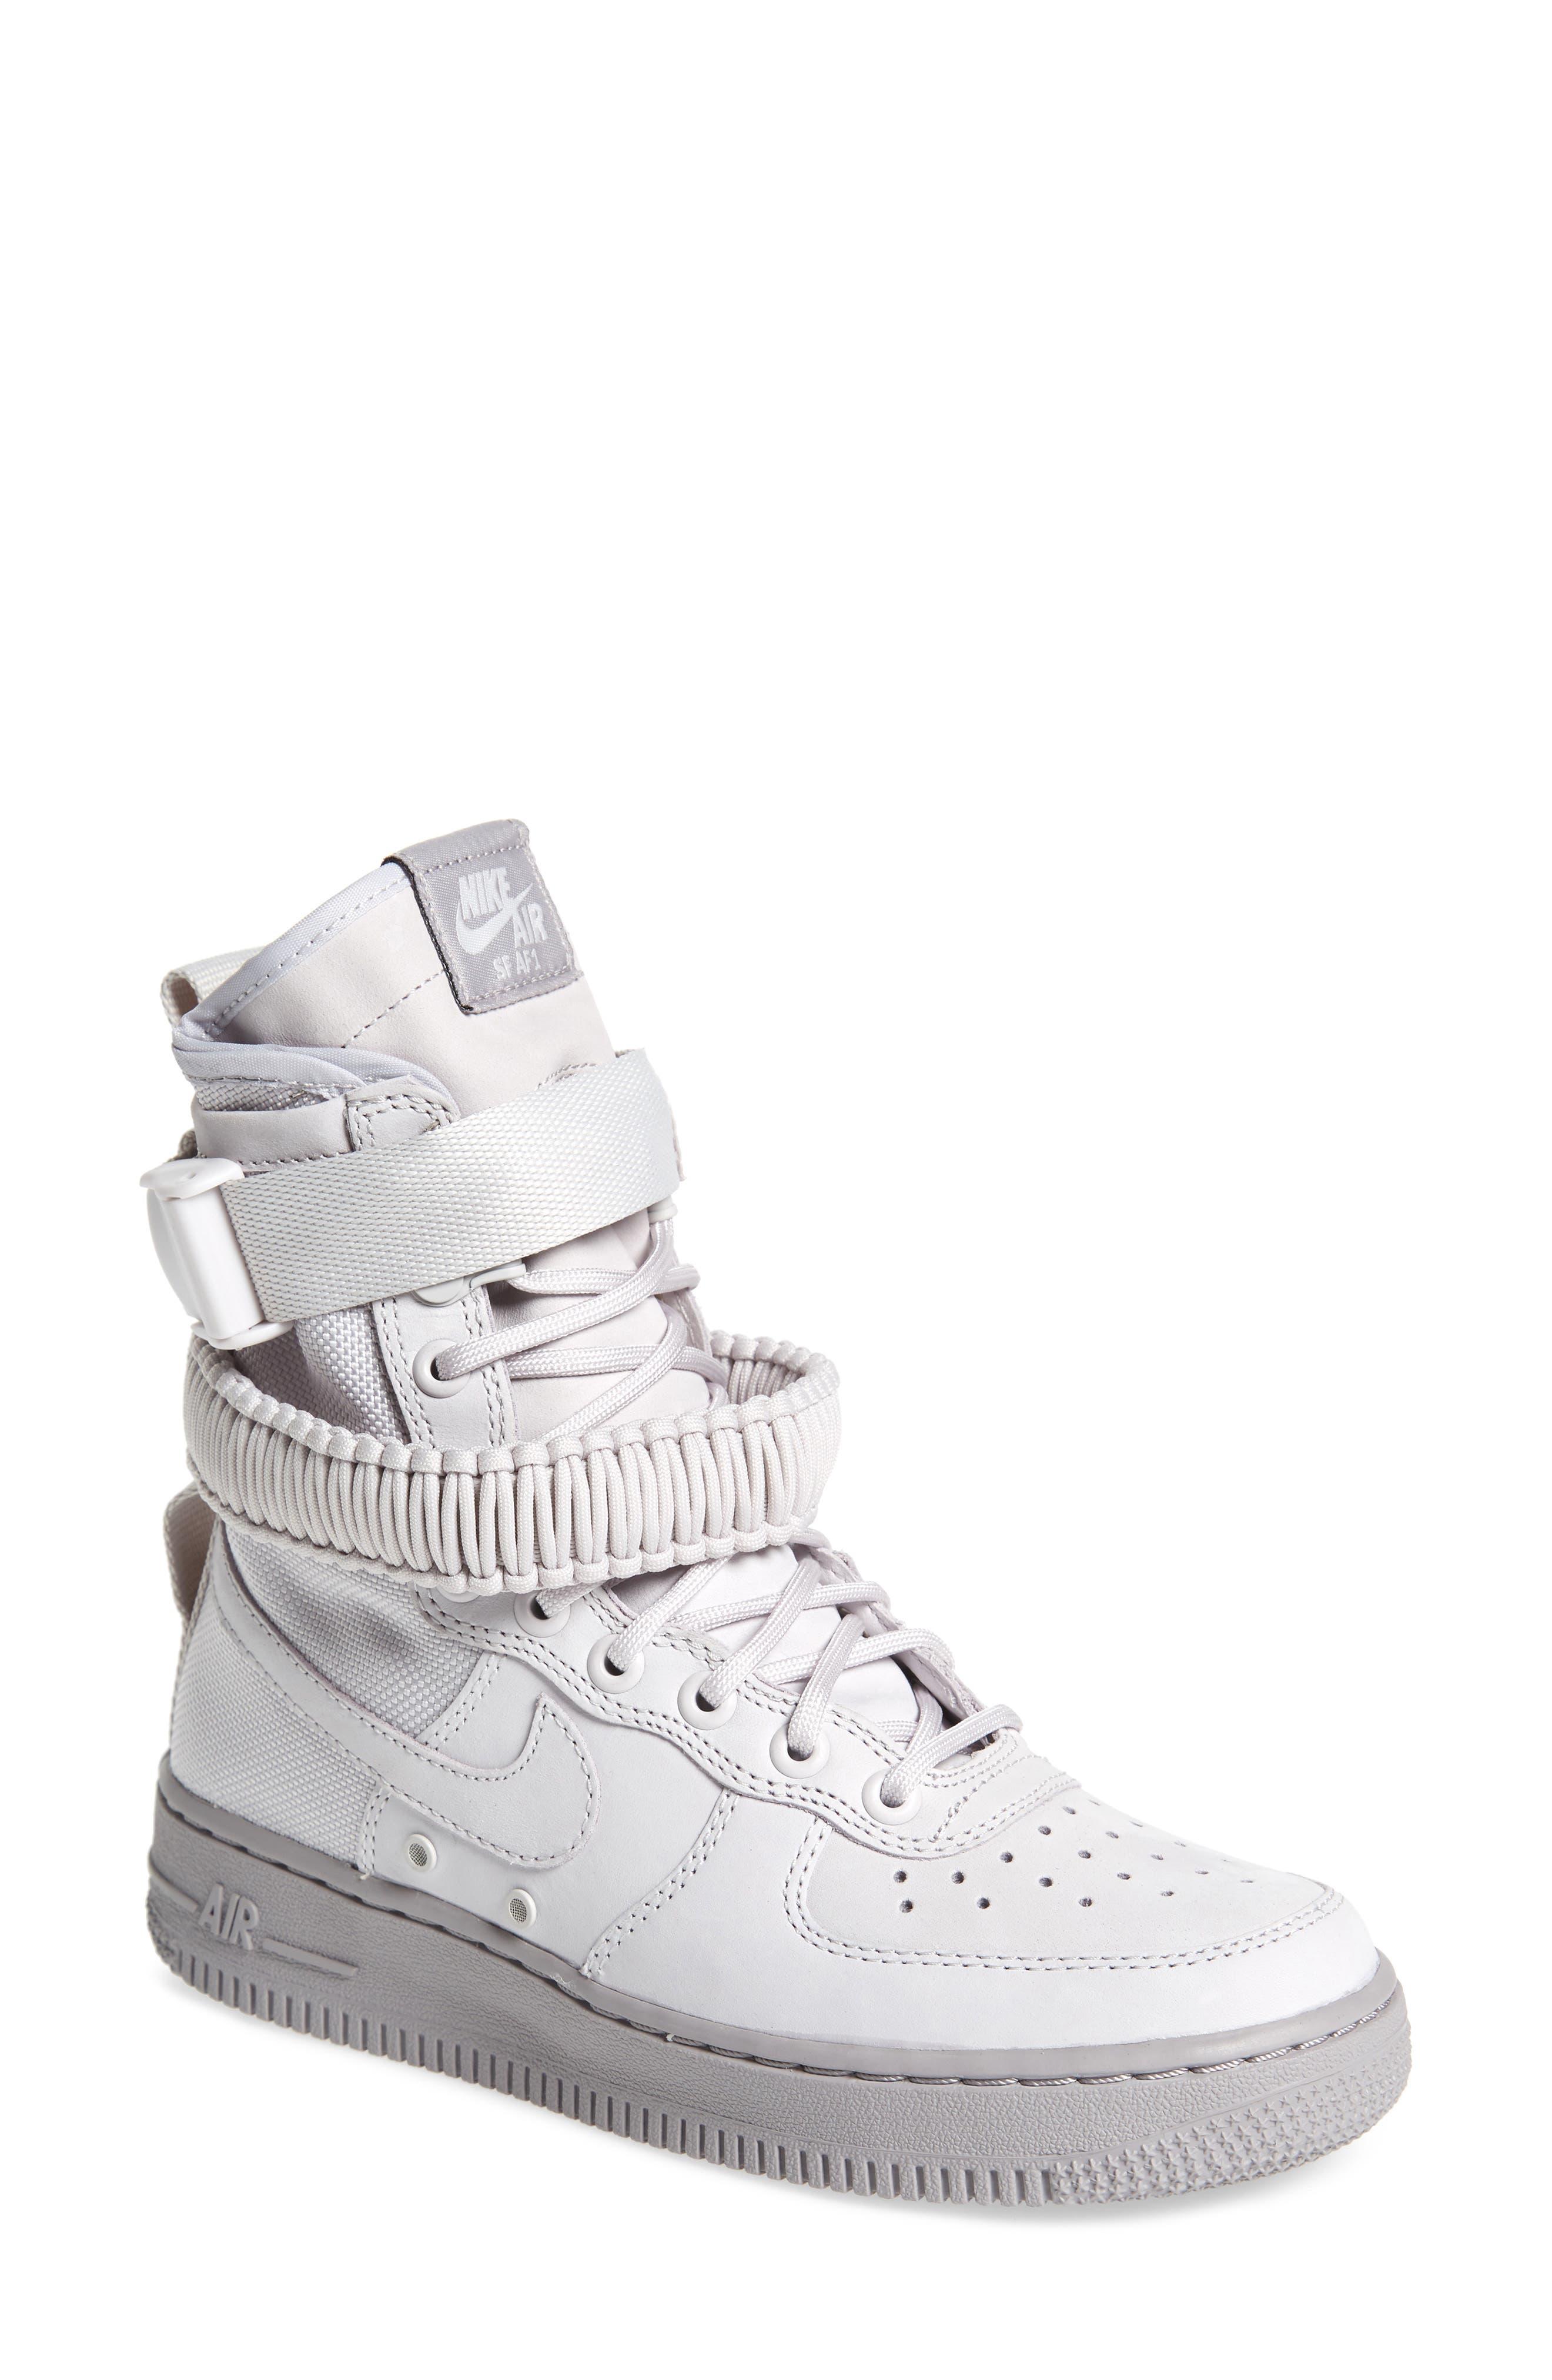 SF Air Force 1 High Top Sneaker,                             Main thumbnail 1, color,                             Vast Grey/ Vast Grey